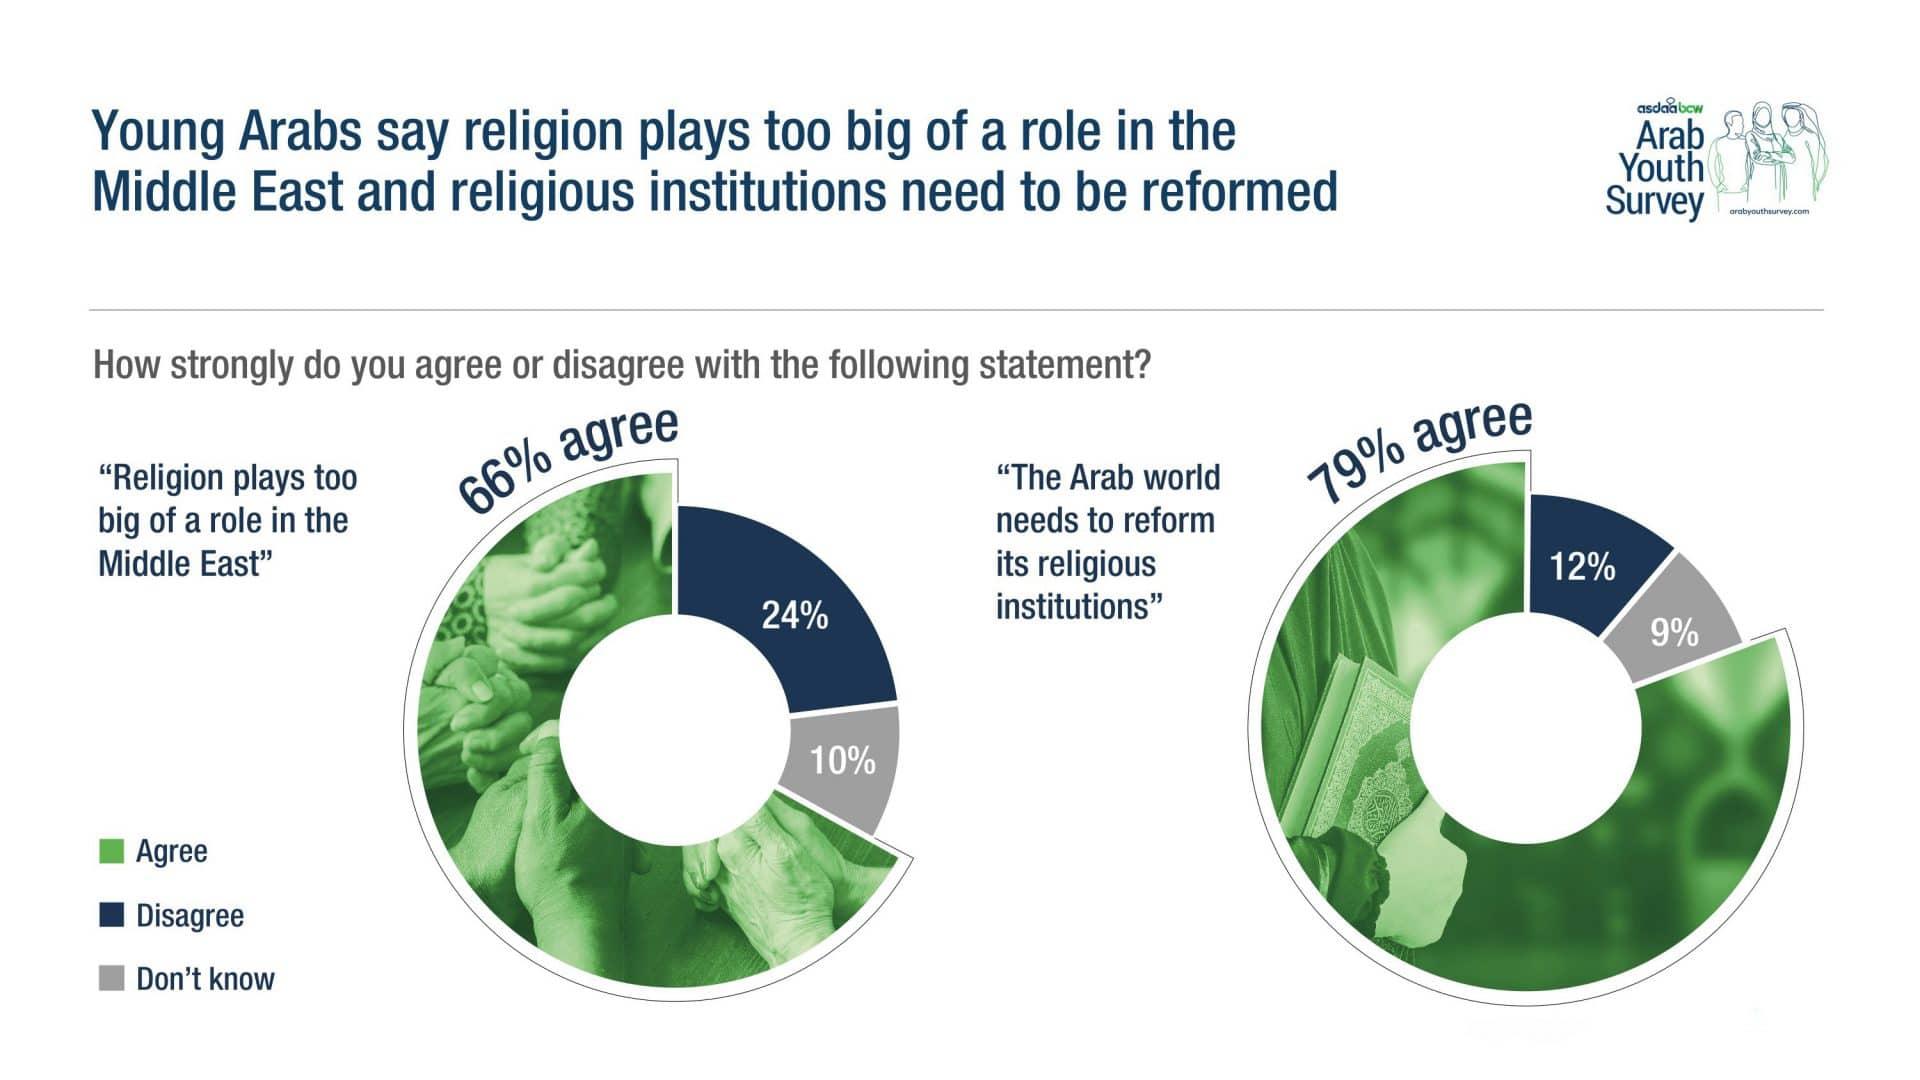 A Survey of Arab Youth highlights Gaps between Policies and Aspirations, A Survey of Arab Youth highlights Gaps between Policies and Aspirations